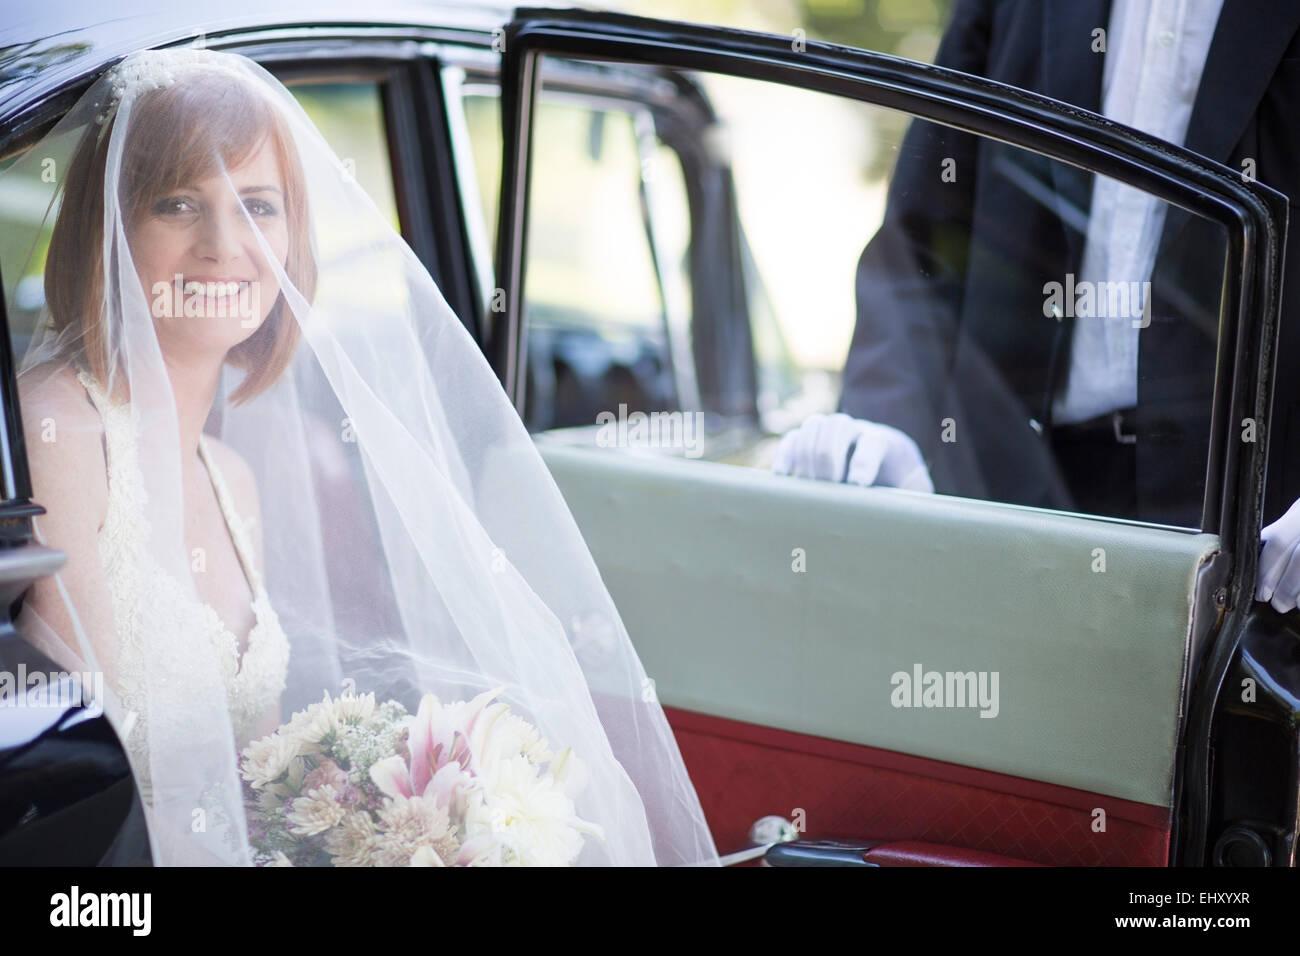 Wedding Chauffeur Stock Photos & Wedding Chauffeur Stock Images - Alamy